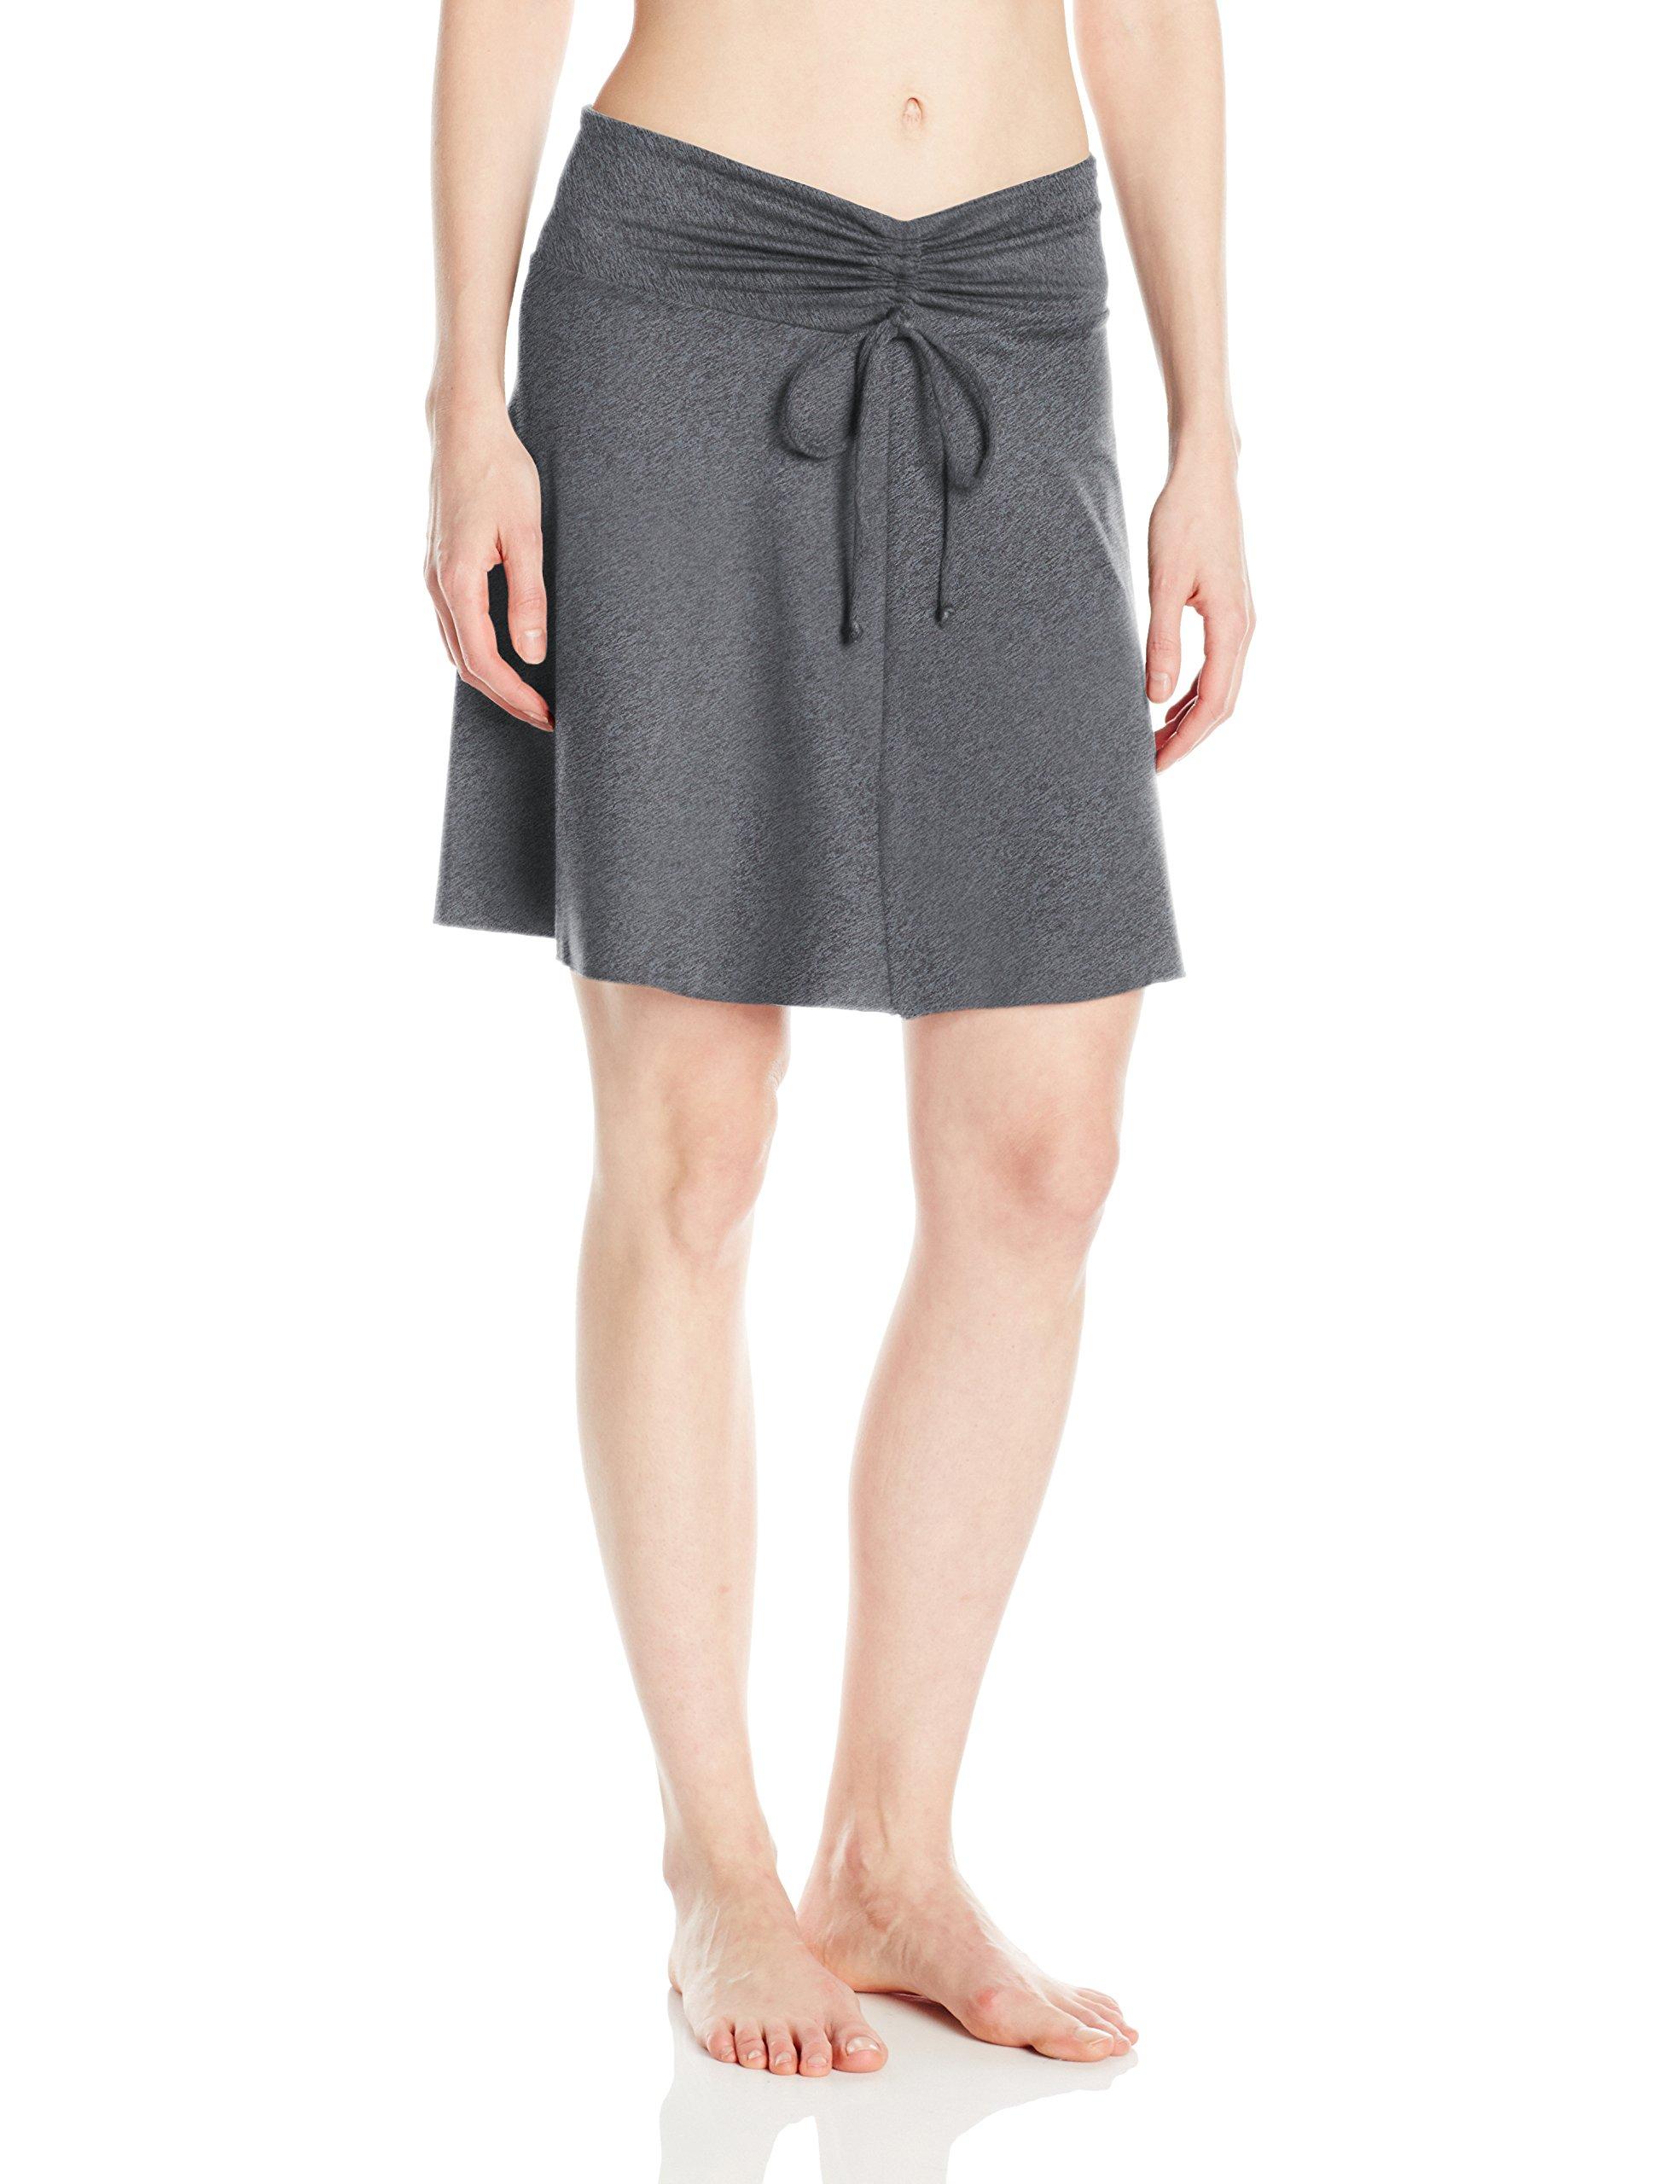 Soybu Women's Serendipity Skirt, Small, Storm Heather